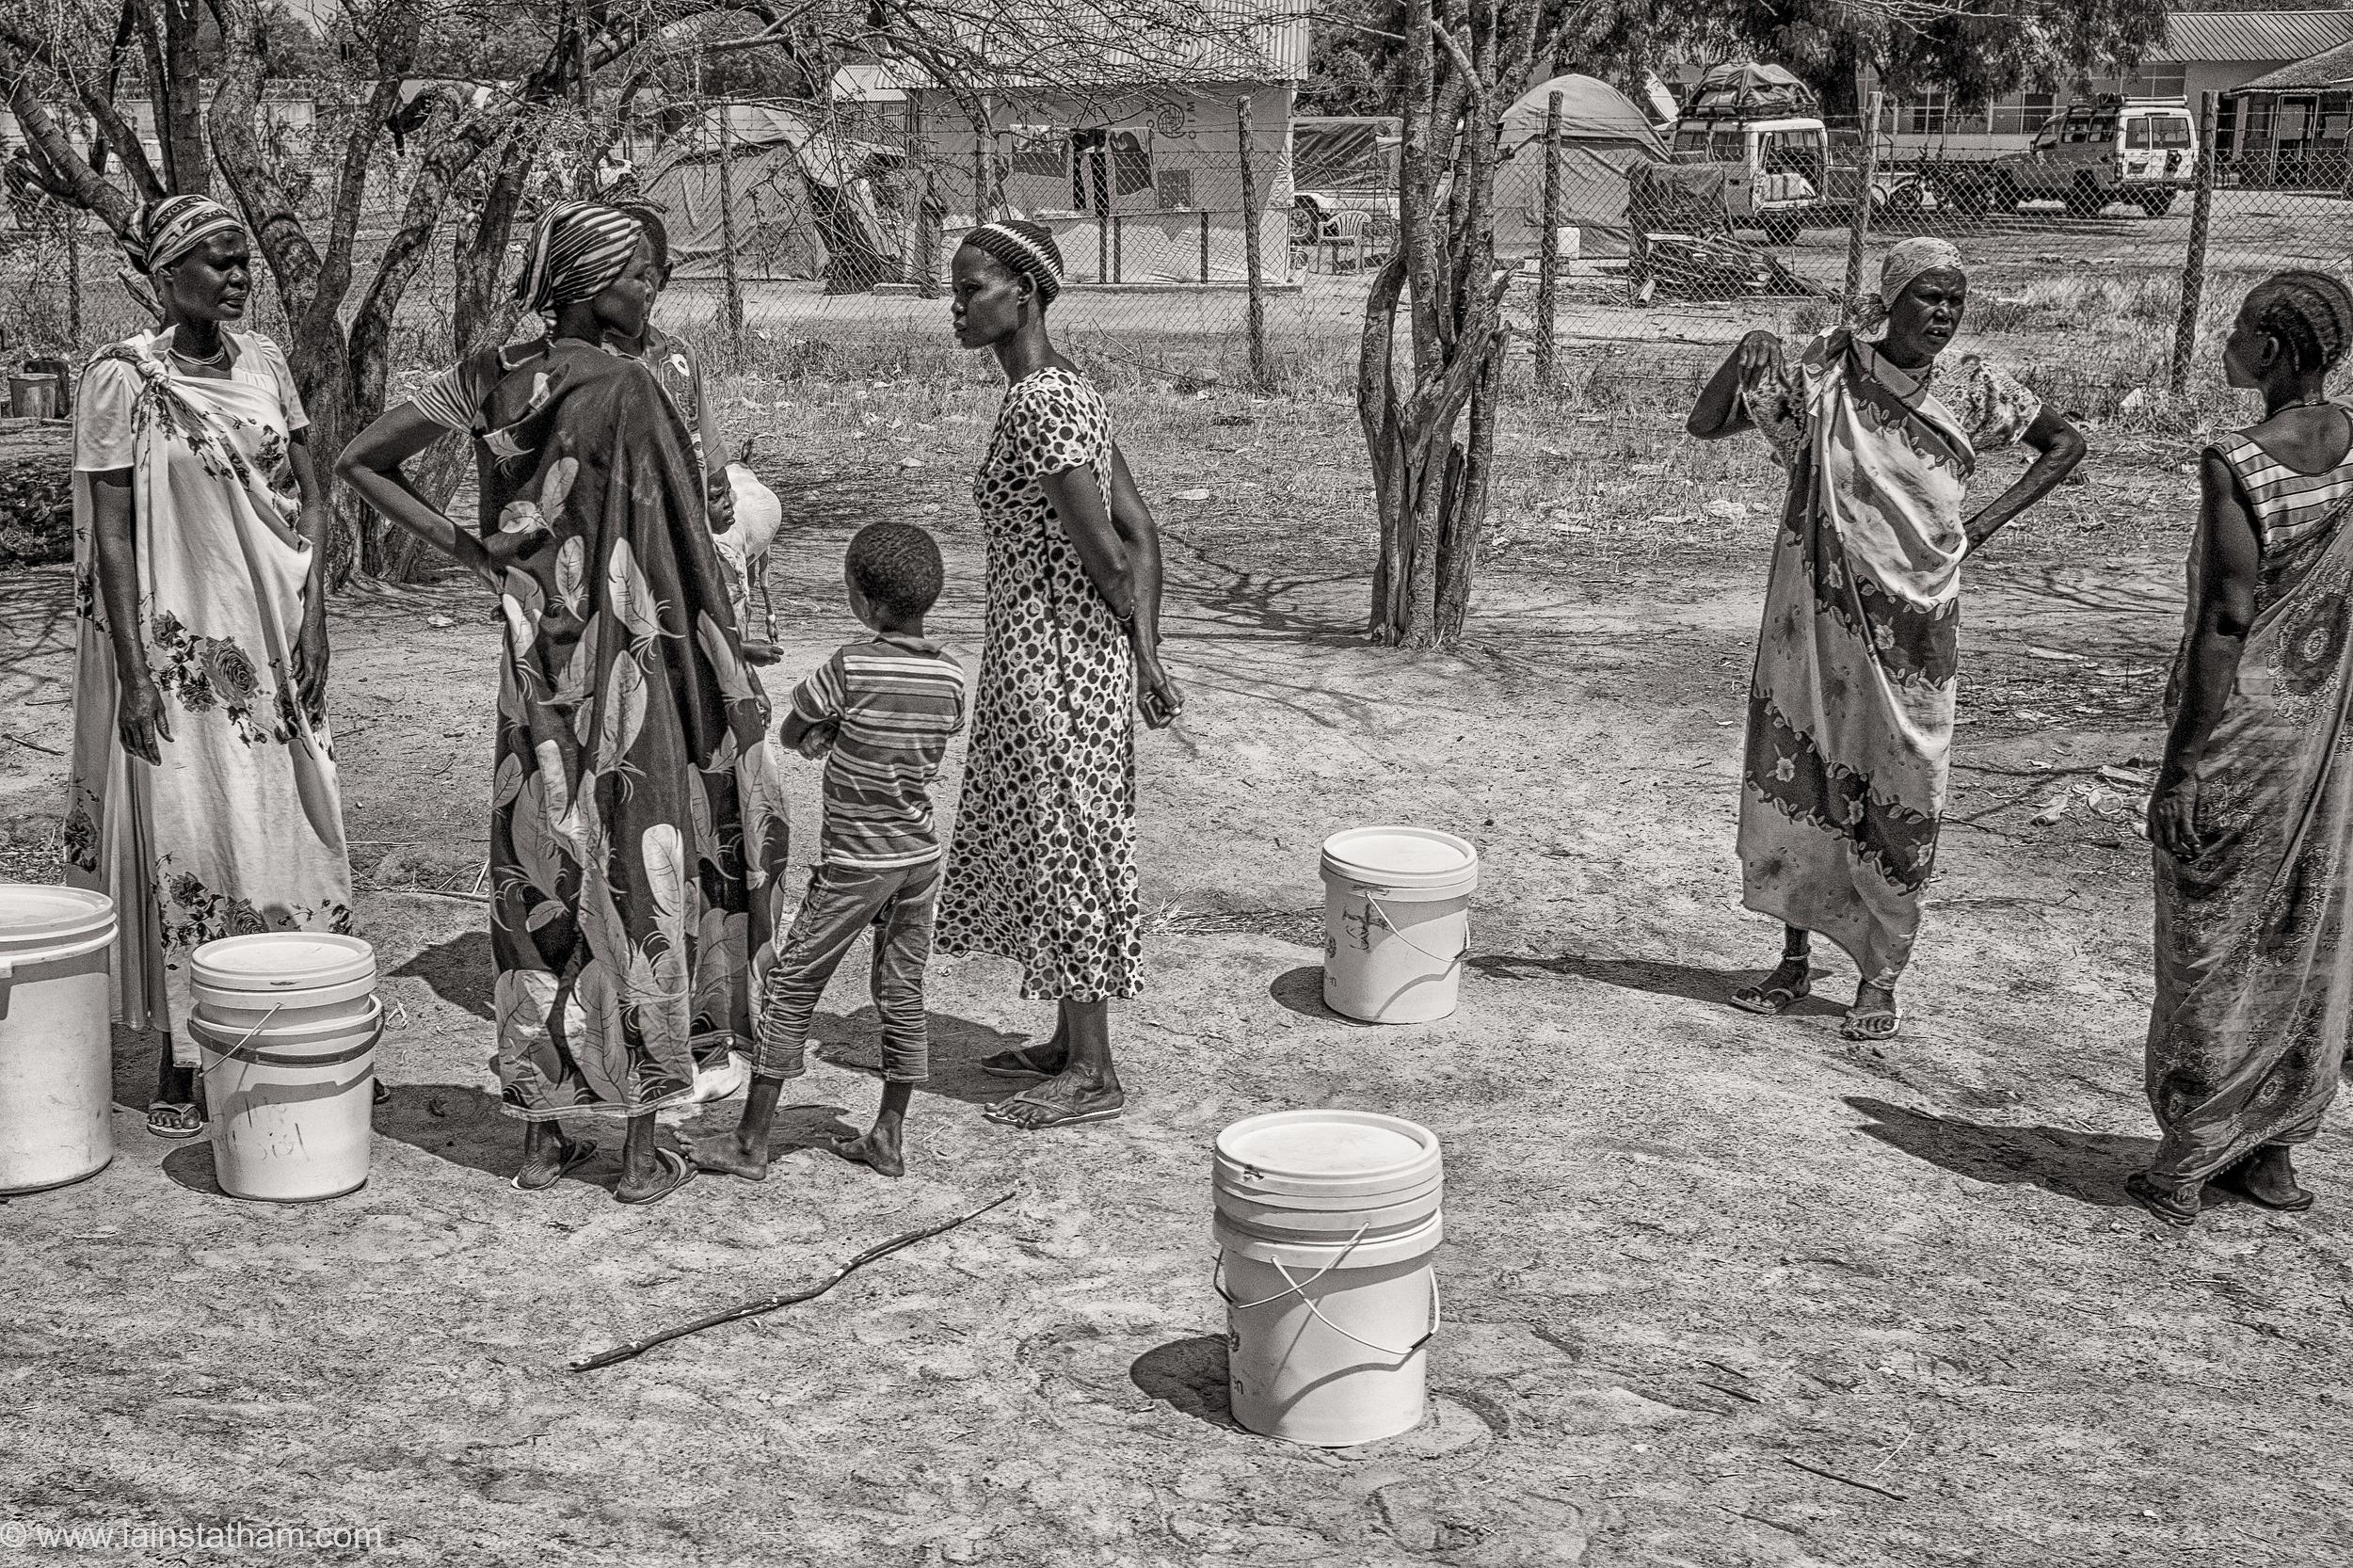 south sudan - unmiss - bw - 2016-9.jpg